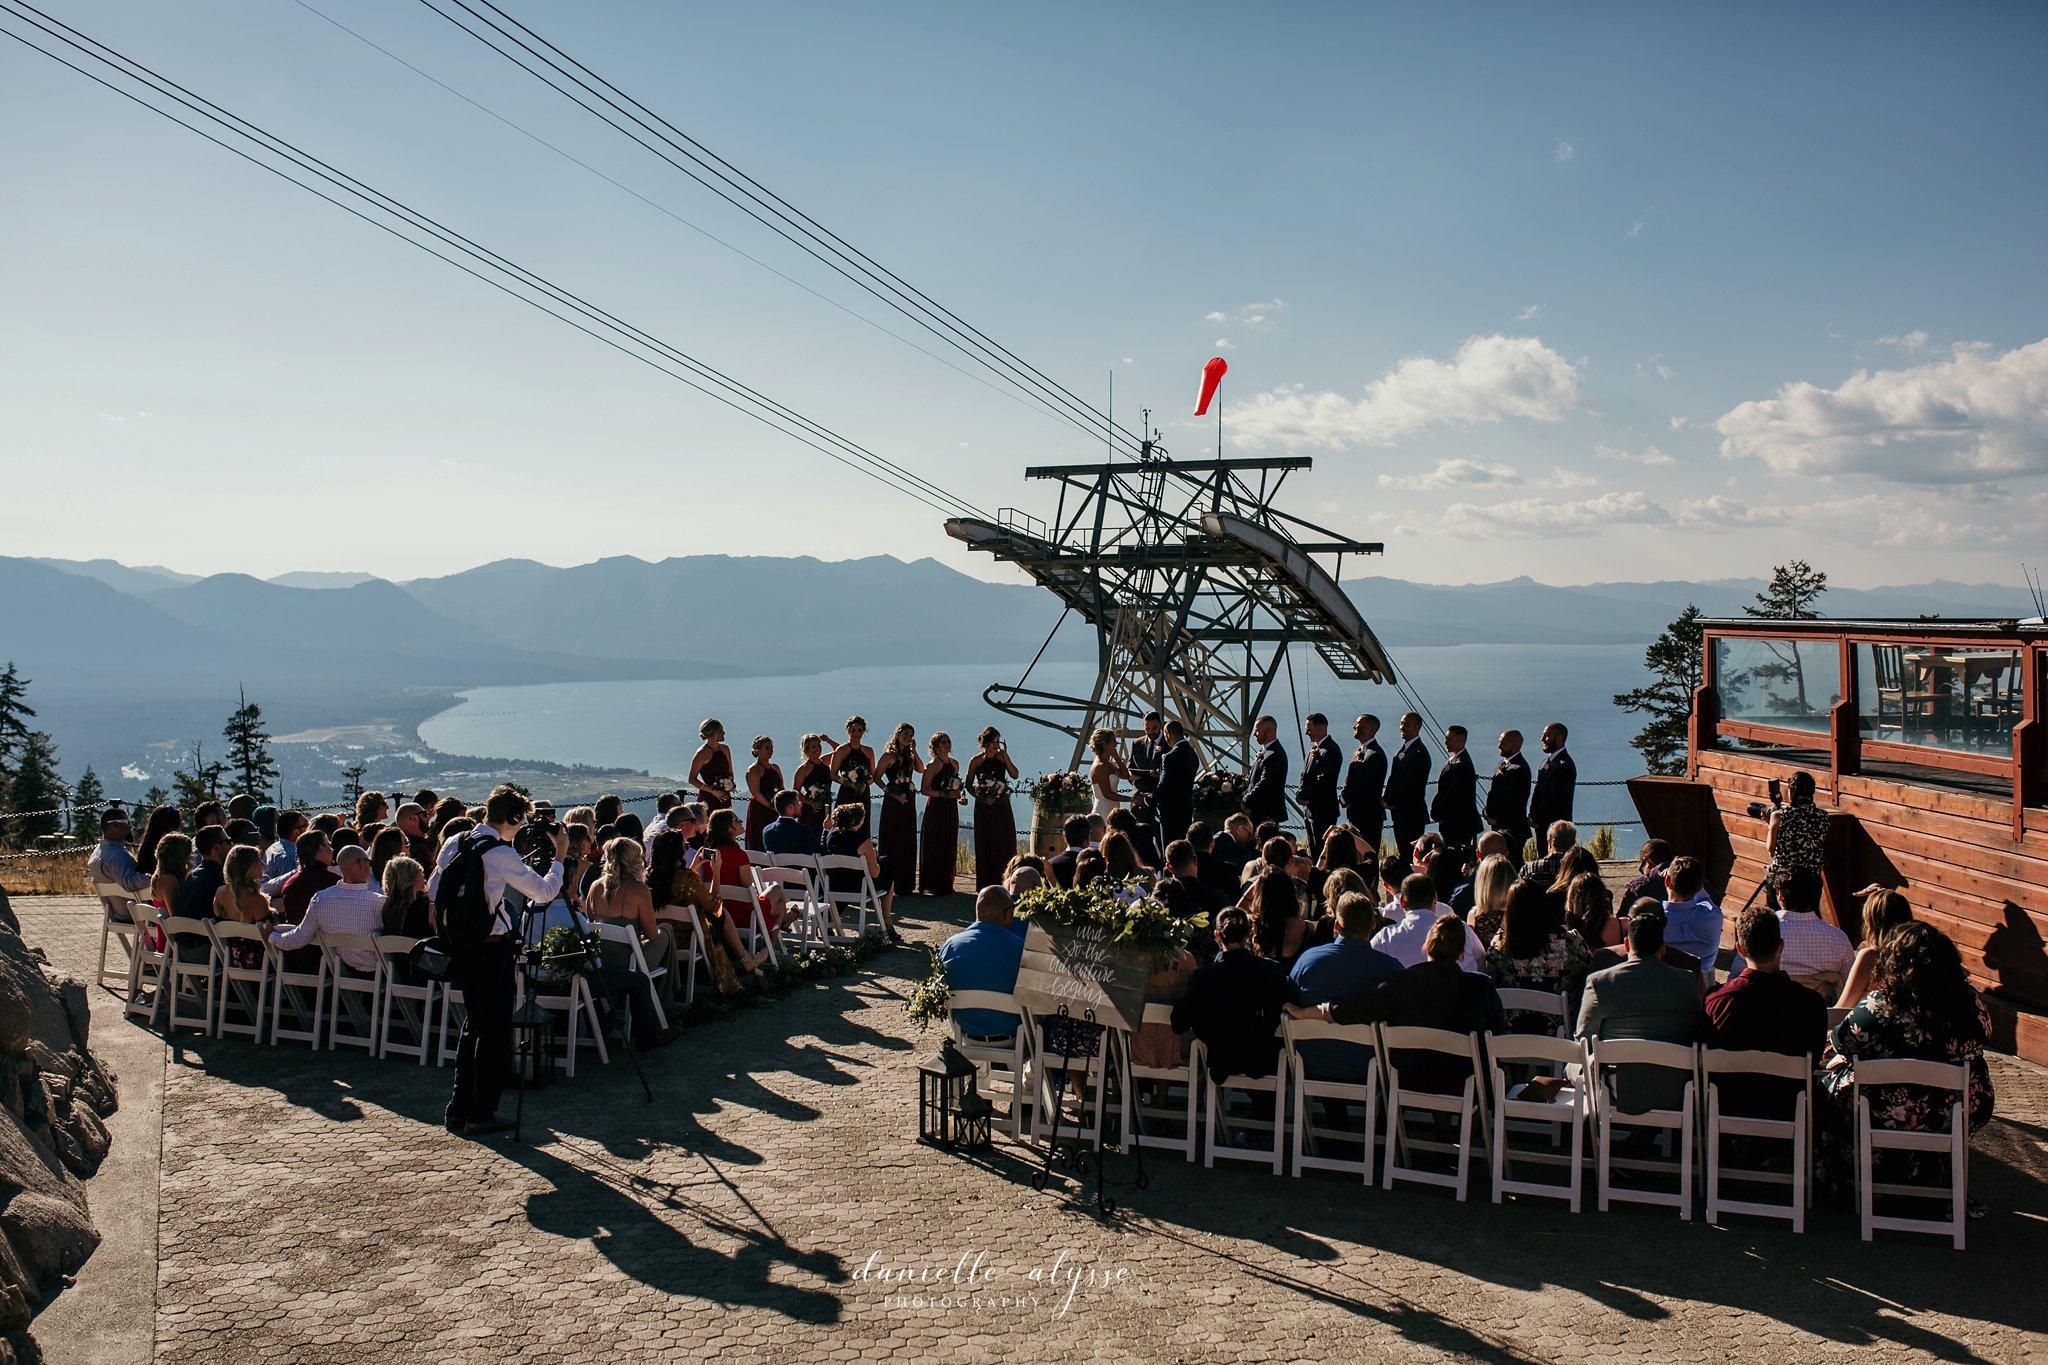 180831_wedding_stephanie_heavenly_south_lake_tahoe_danielle_alysse_photography_destination_blog_670_WEB.jpg